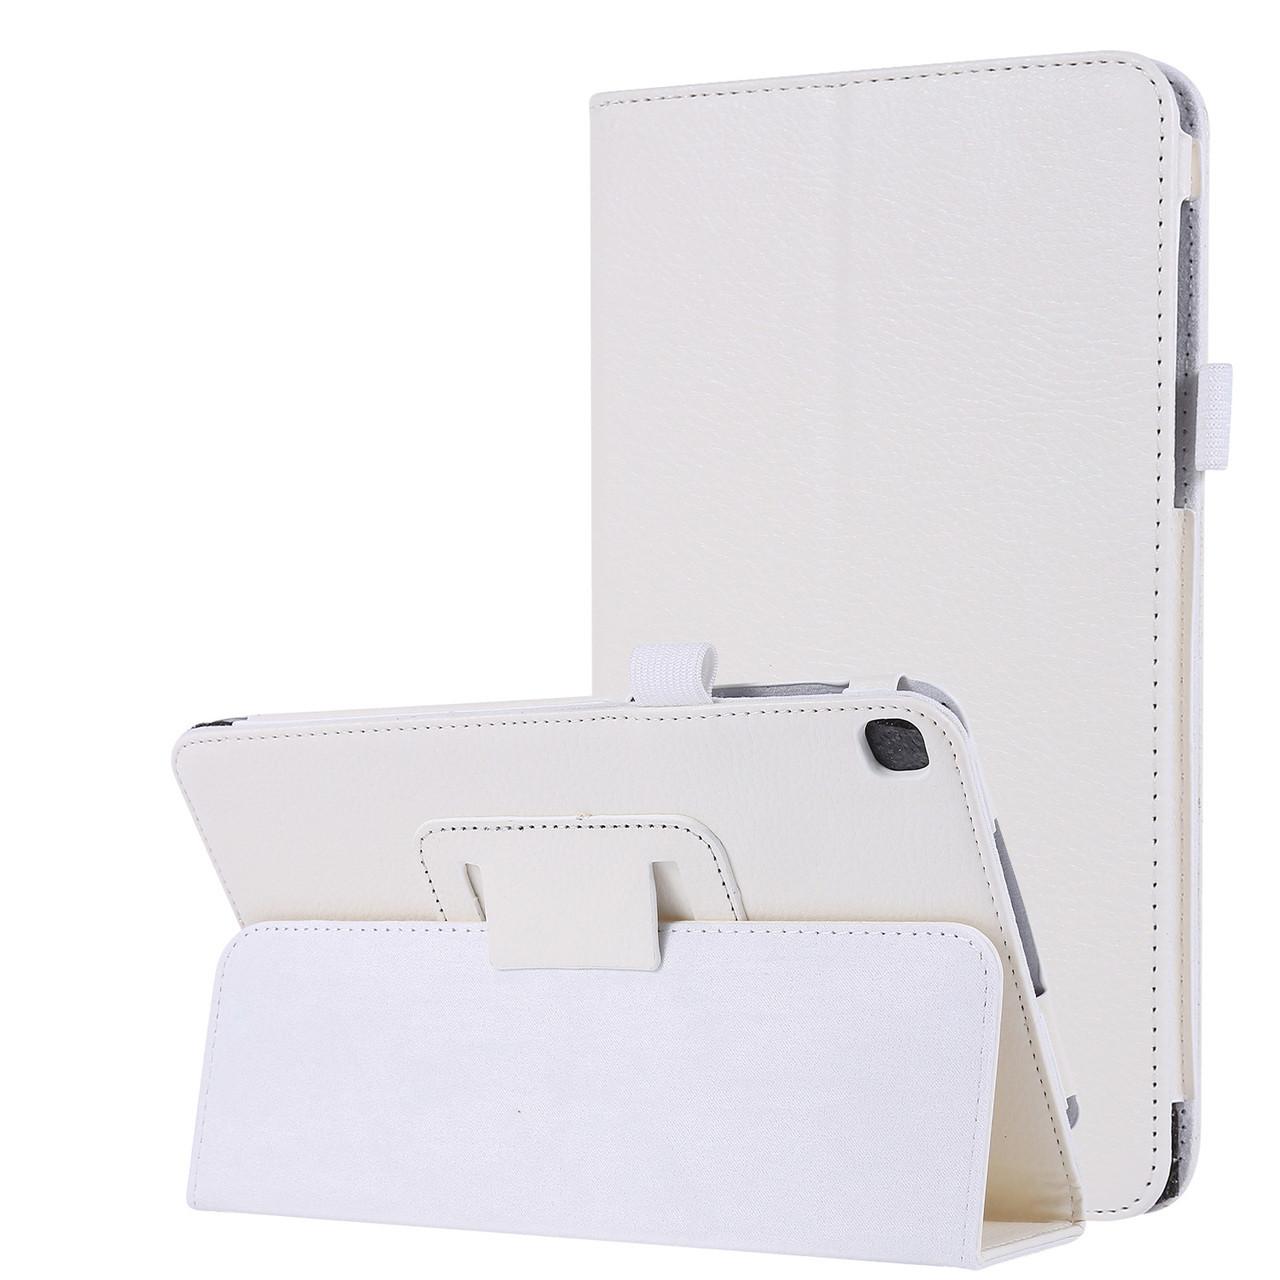 "Чехол книжка TTX Leather Book для Samsung Galaxy Tab A 8.0"" SM-T290 SM-T295 2019 белый"